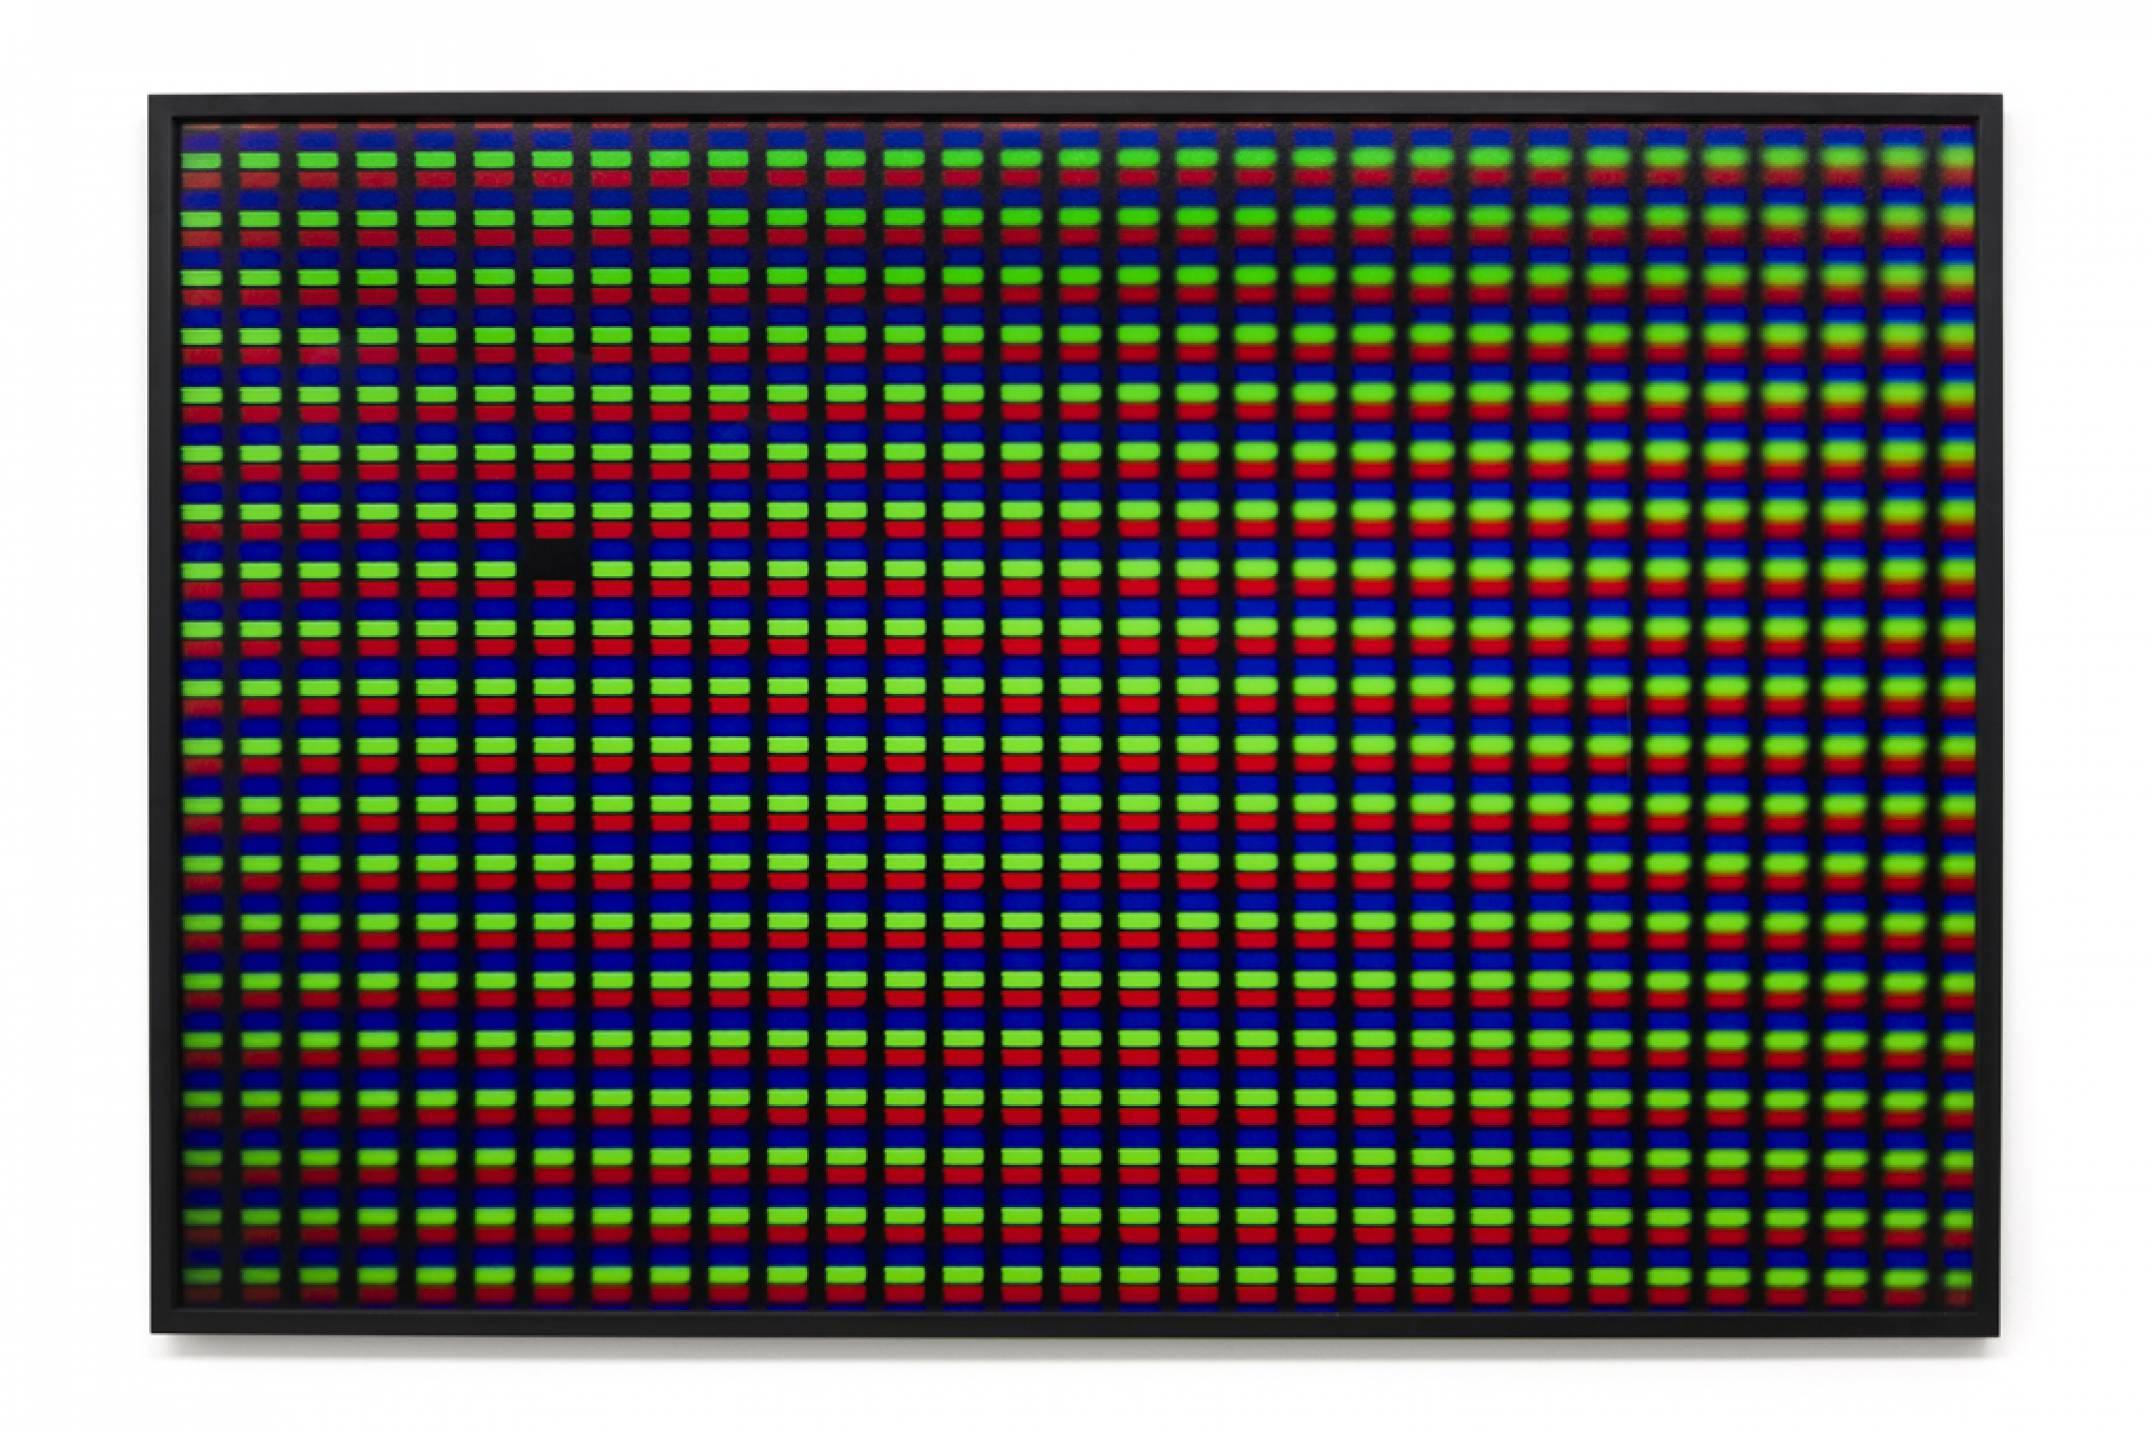 Roberto WInter, <em>Dead pixel (Ipod)</em>, 2017, impressão jato de tinta sobre papel Hahnemühle FineArt Baryta, 110 × 165 cm - Mendes Wood DM